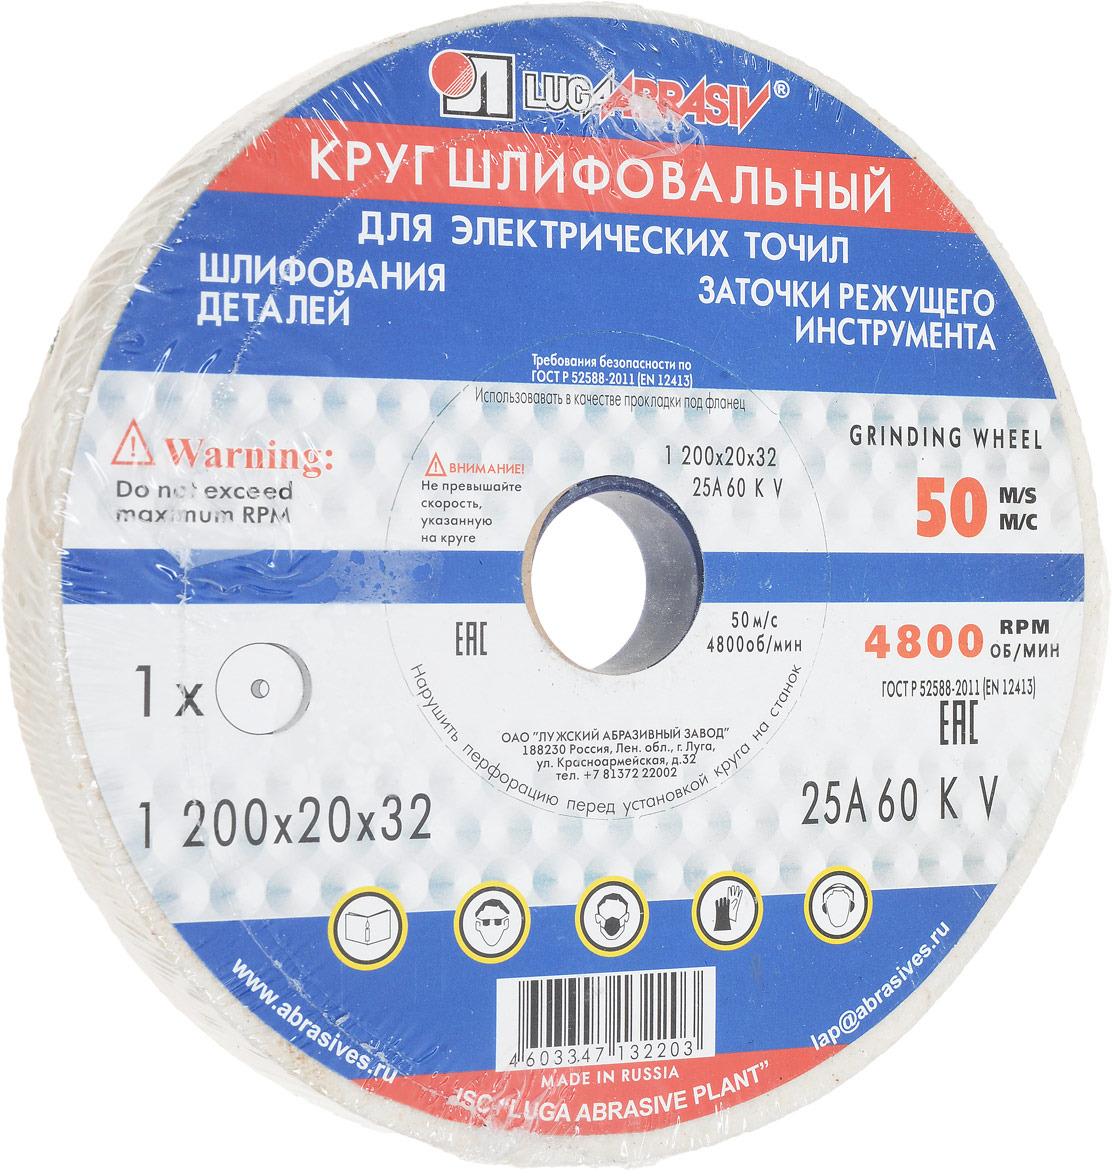 Круг шлифовальный, 25А, F60, (K, L), 200 х 20 х 32 мм